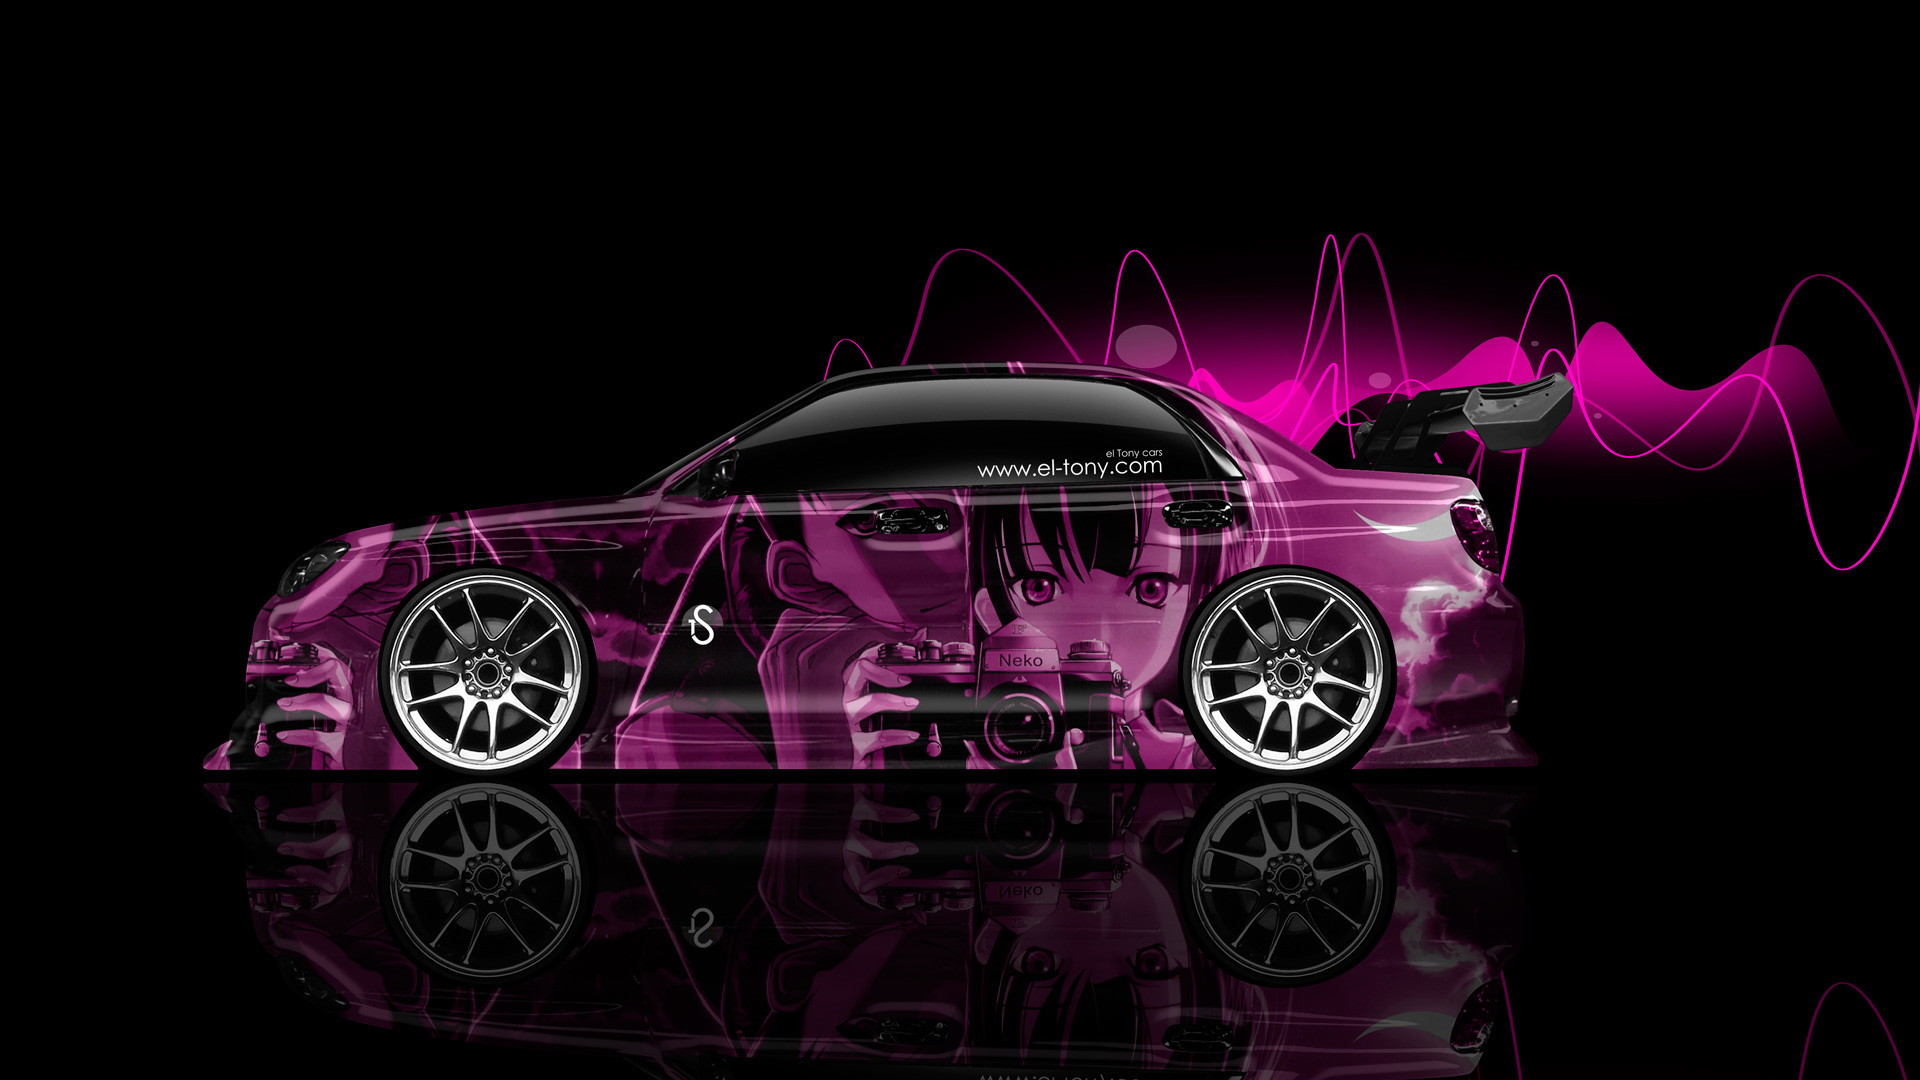 Subaru Impreza WRX STI JDM Side Anime Aerography Car 2014